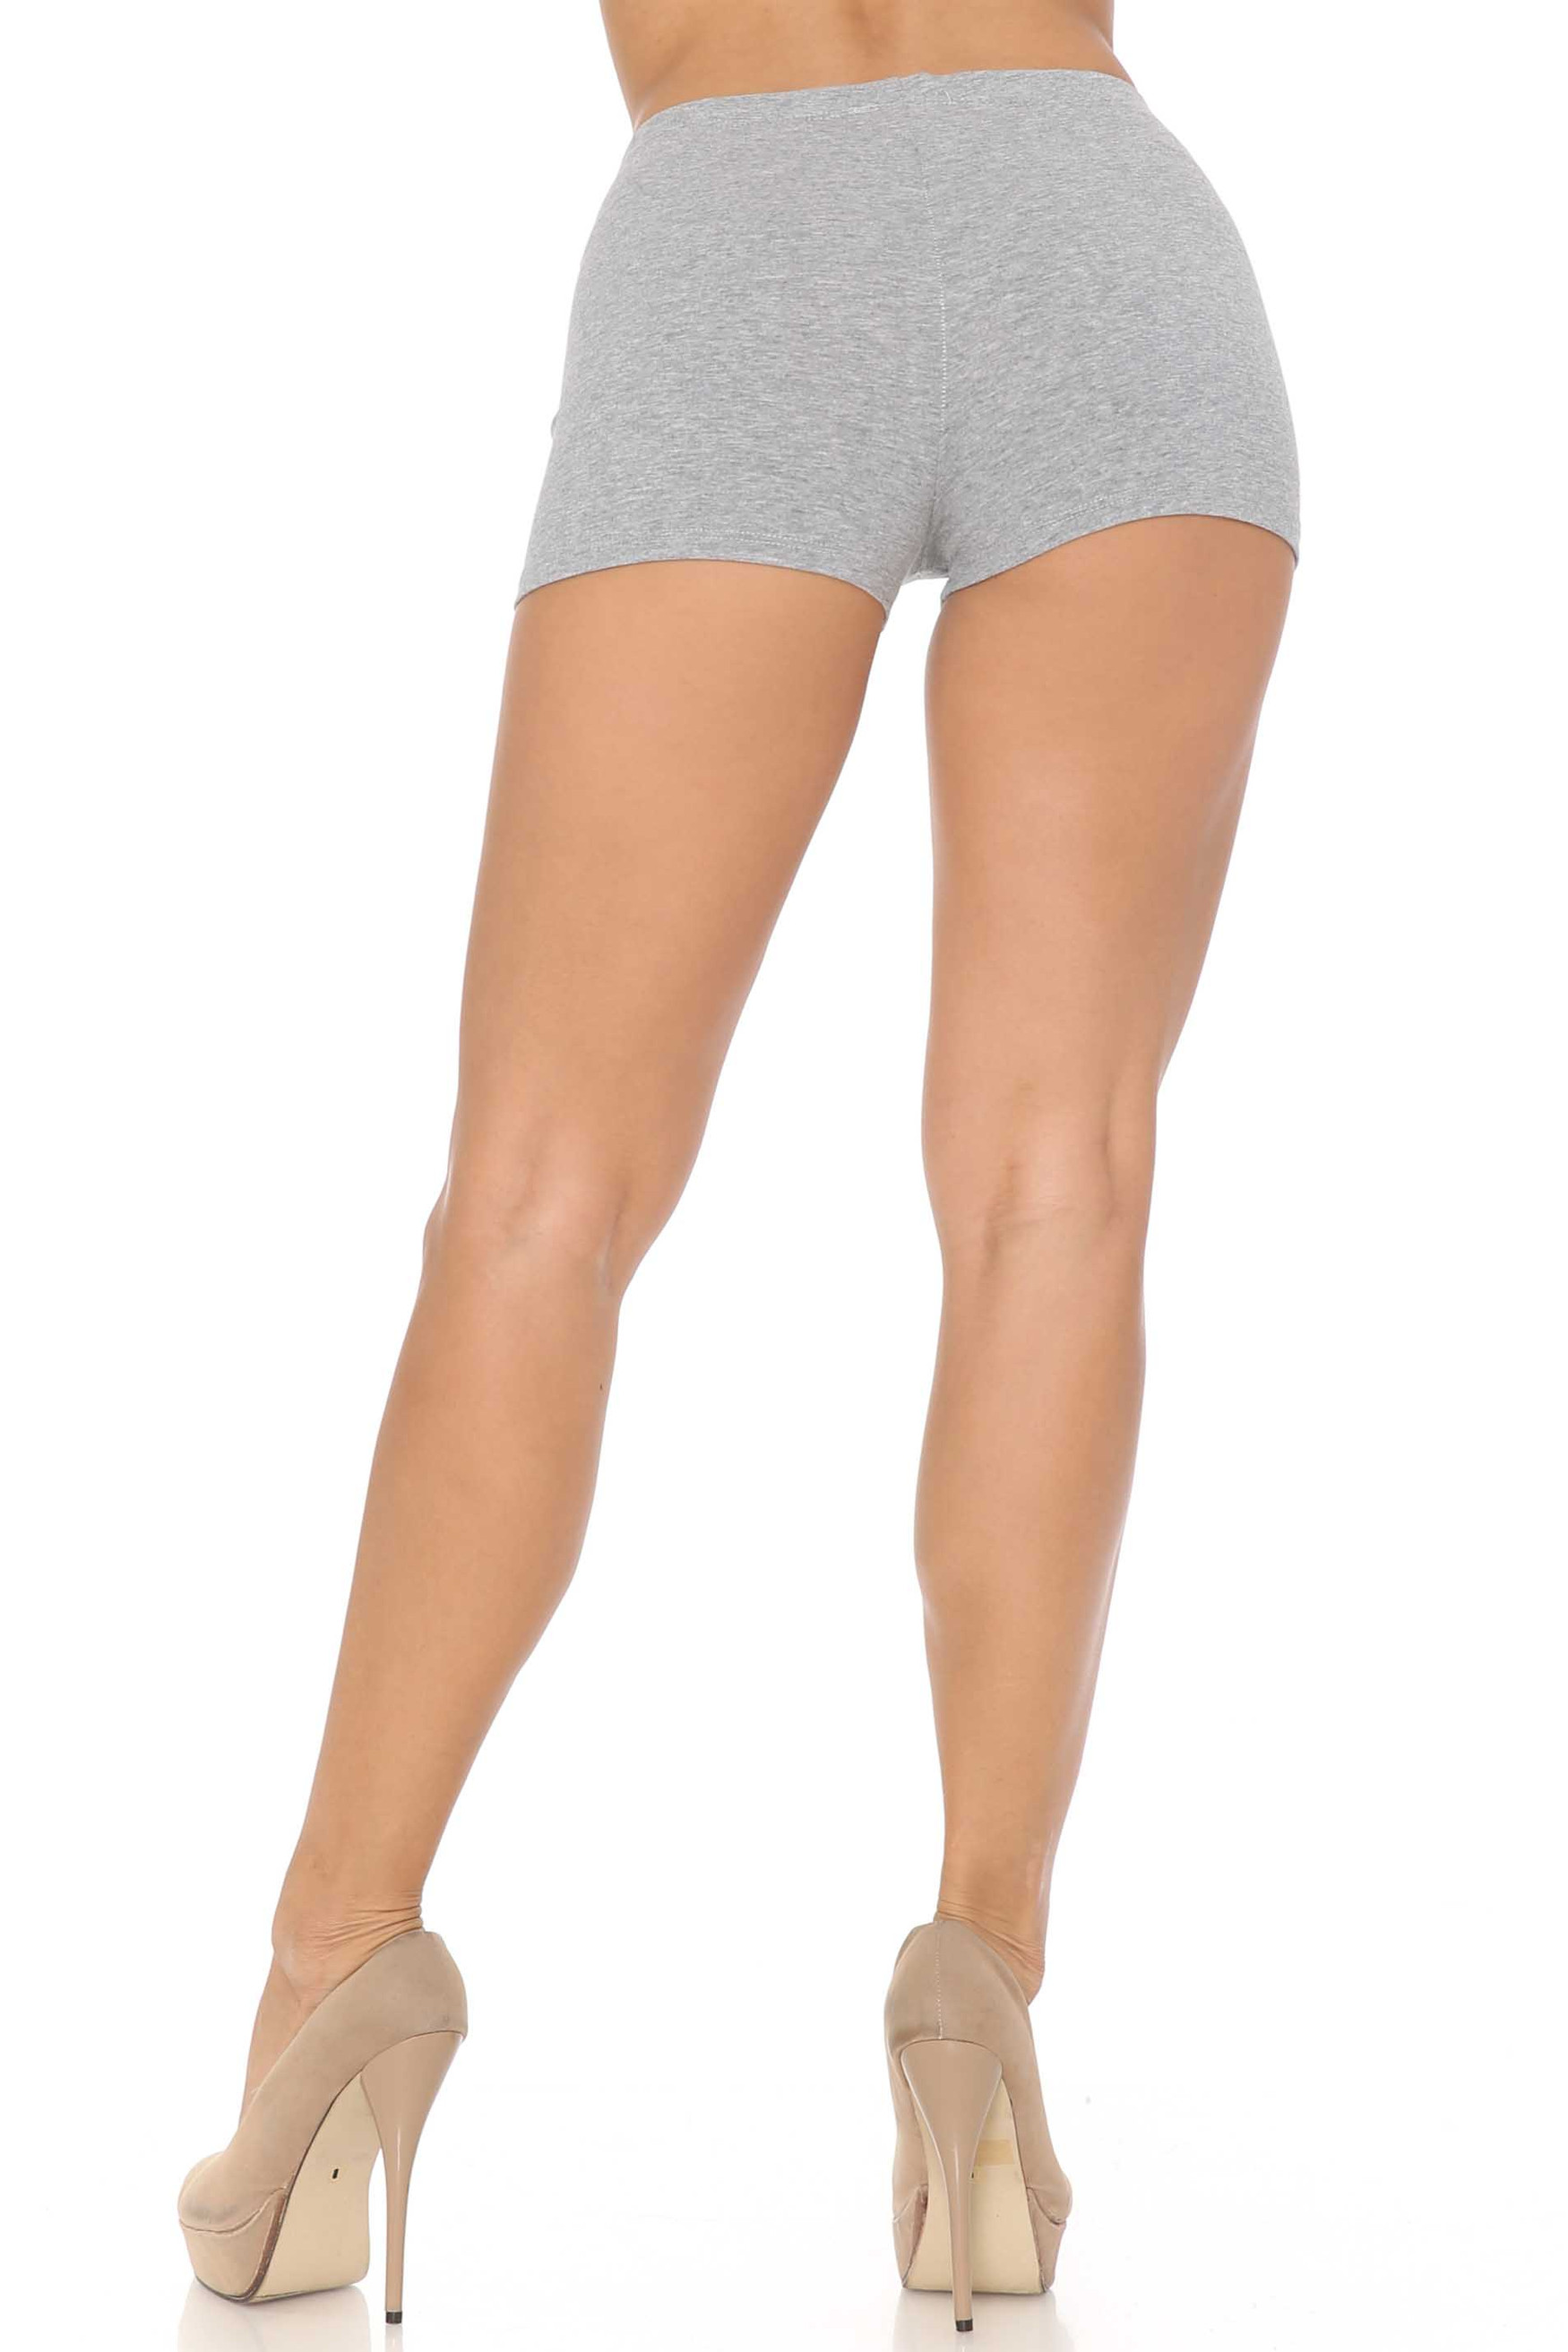 Back view of Heather Gray USA Cotton Boy Shorts